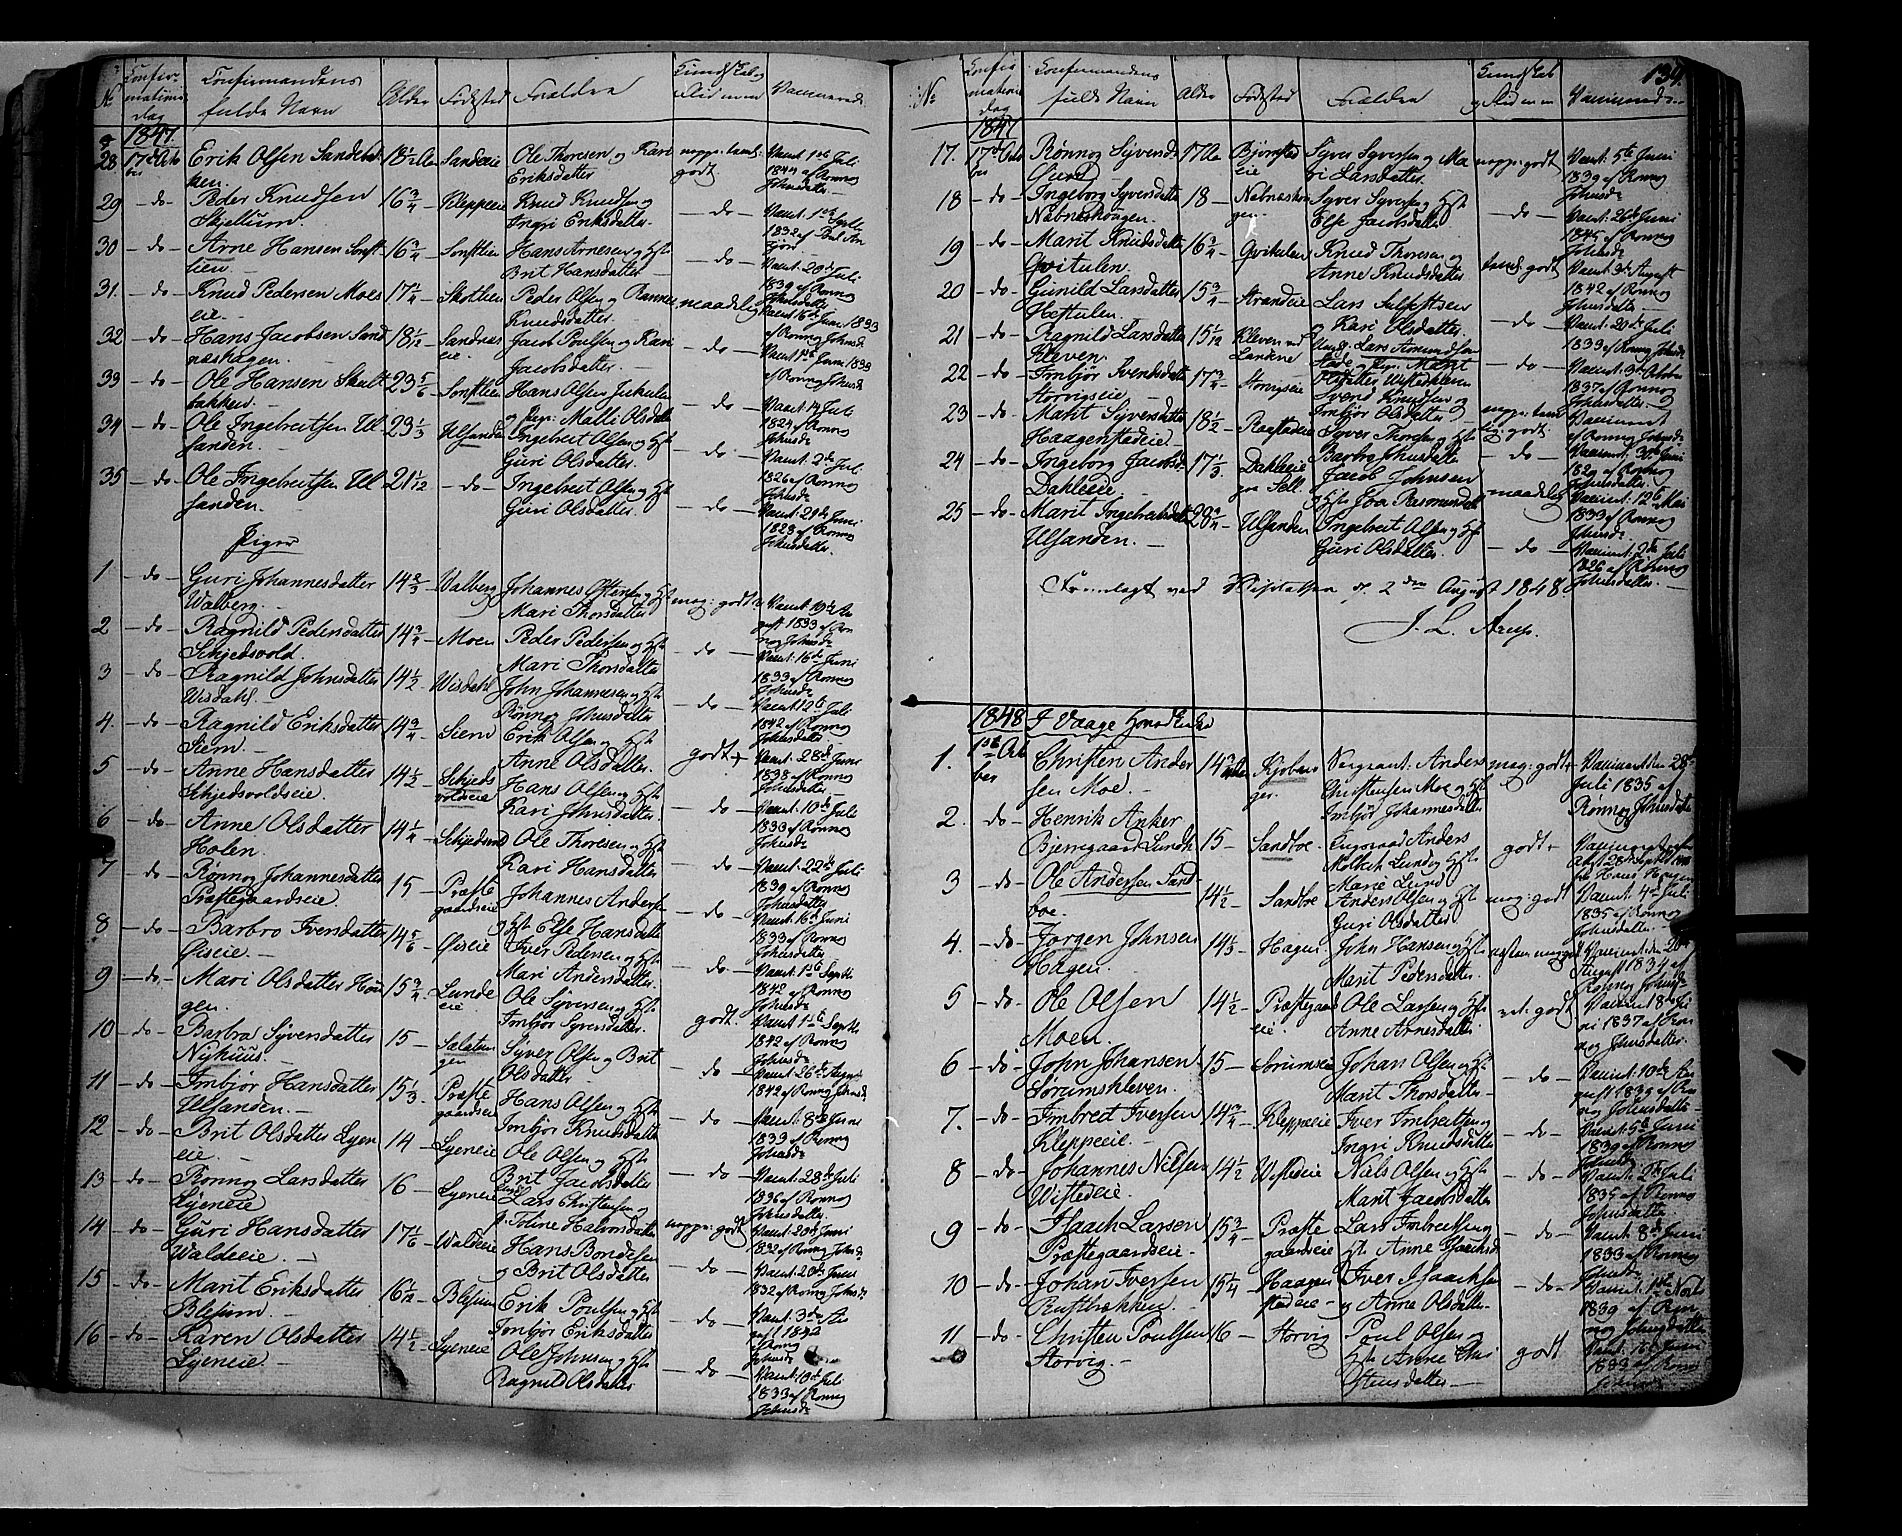 SAH, Vågå prestekontor, Ministerialbok nr. 5 /1, 1842-1856, s. 139